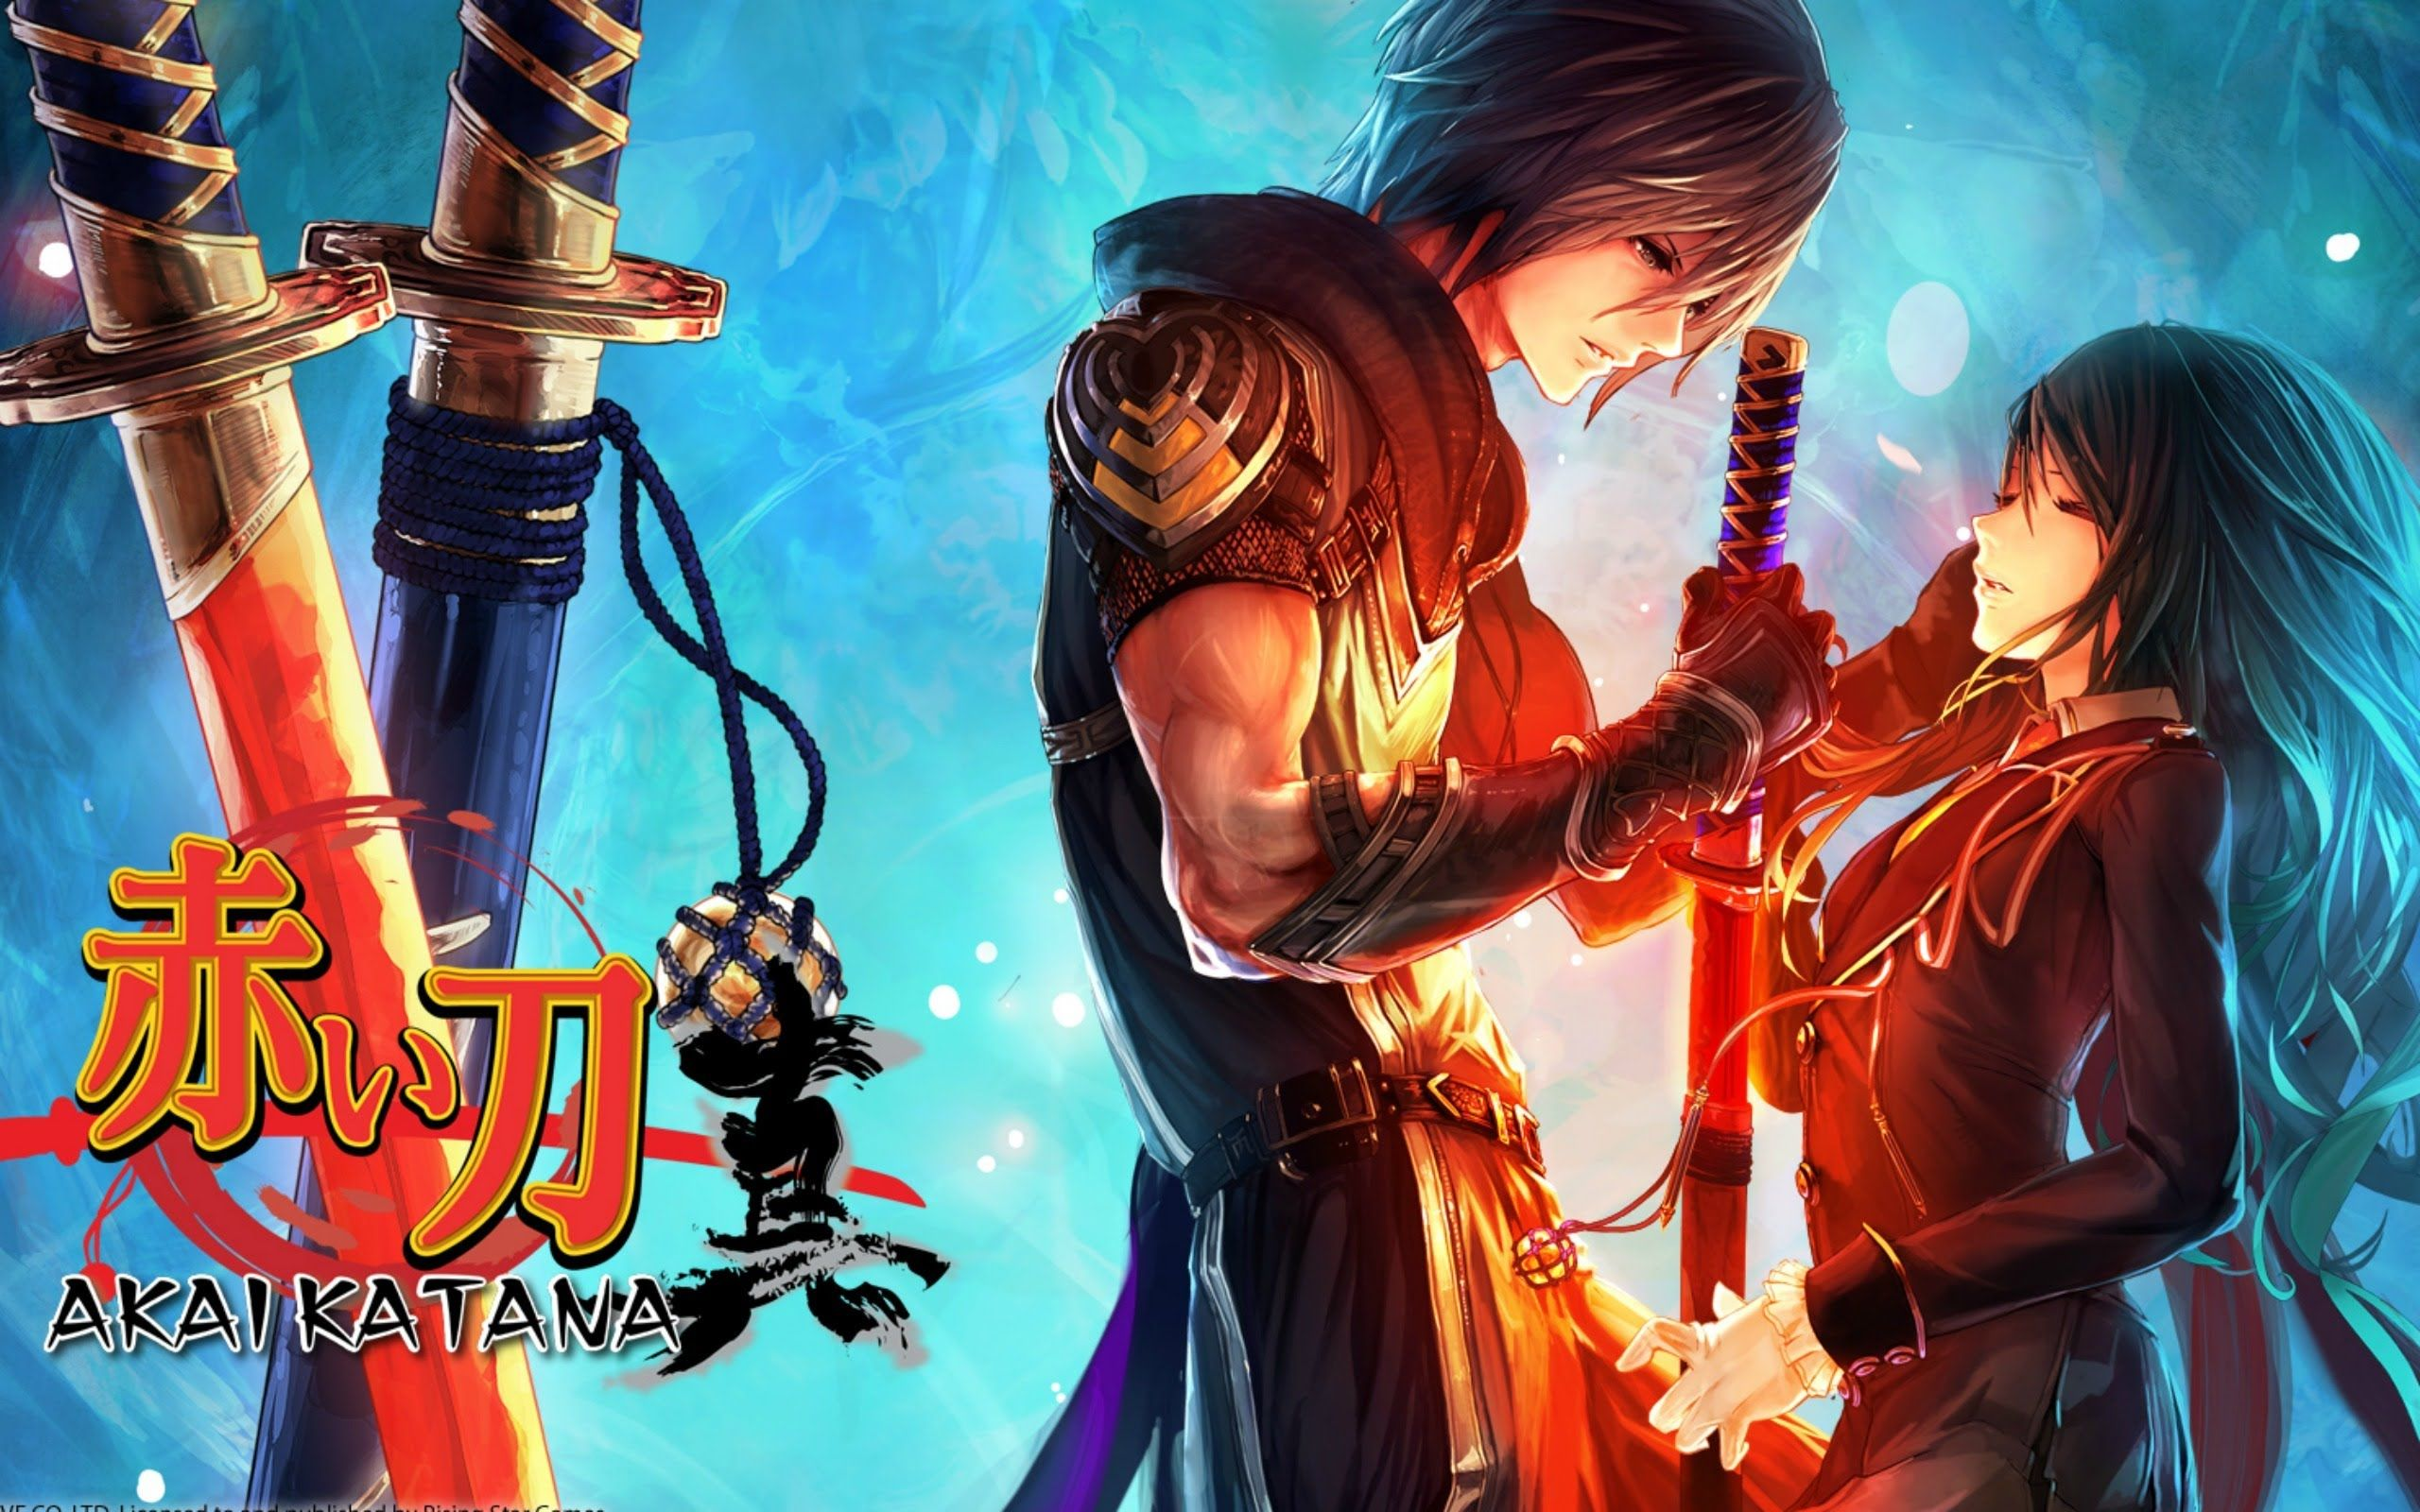 Akai Katana Αναζήτηση Google Videogames I MUST Play